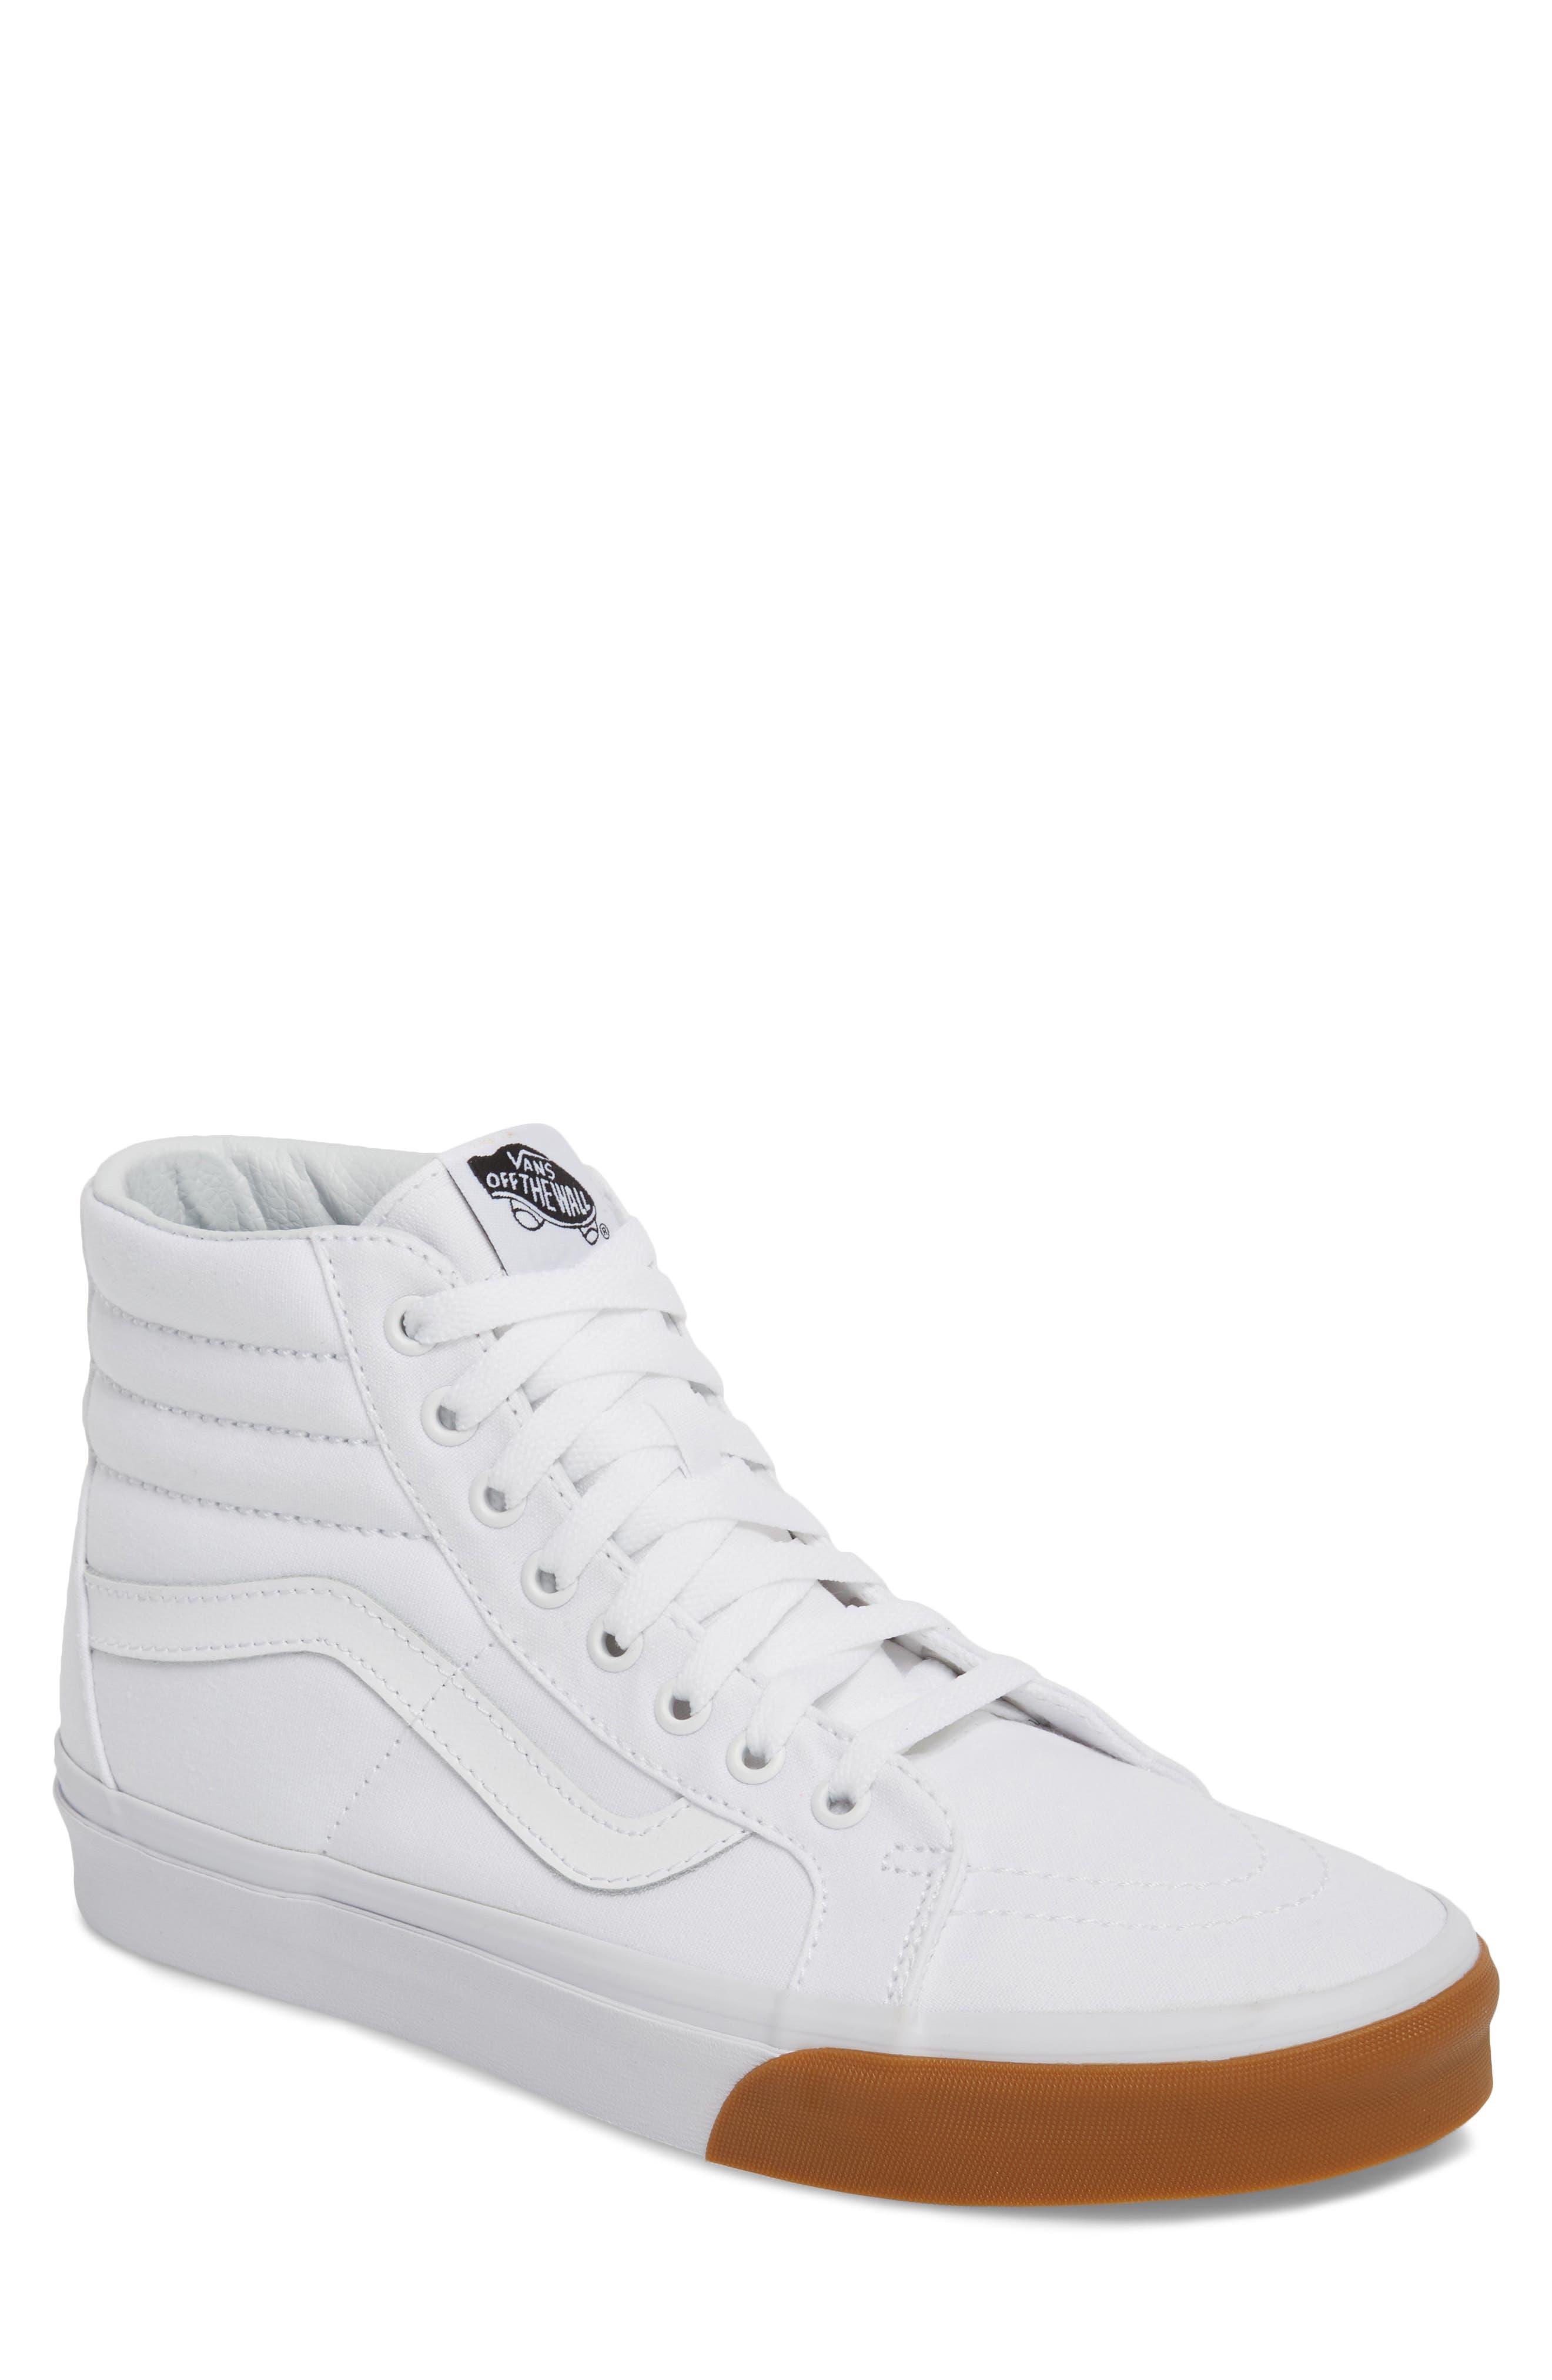 Main Image - Vans 'Sk8-Hi Reissue' Sneaker (Men)